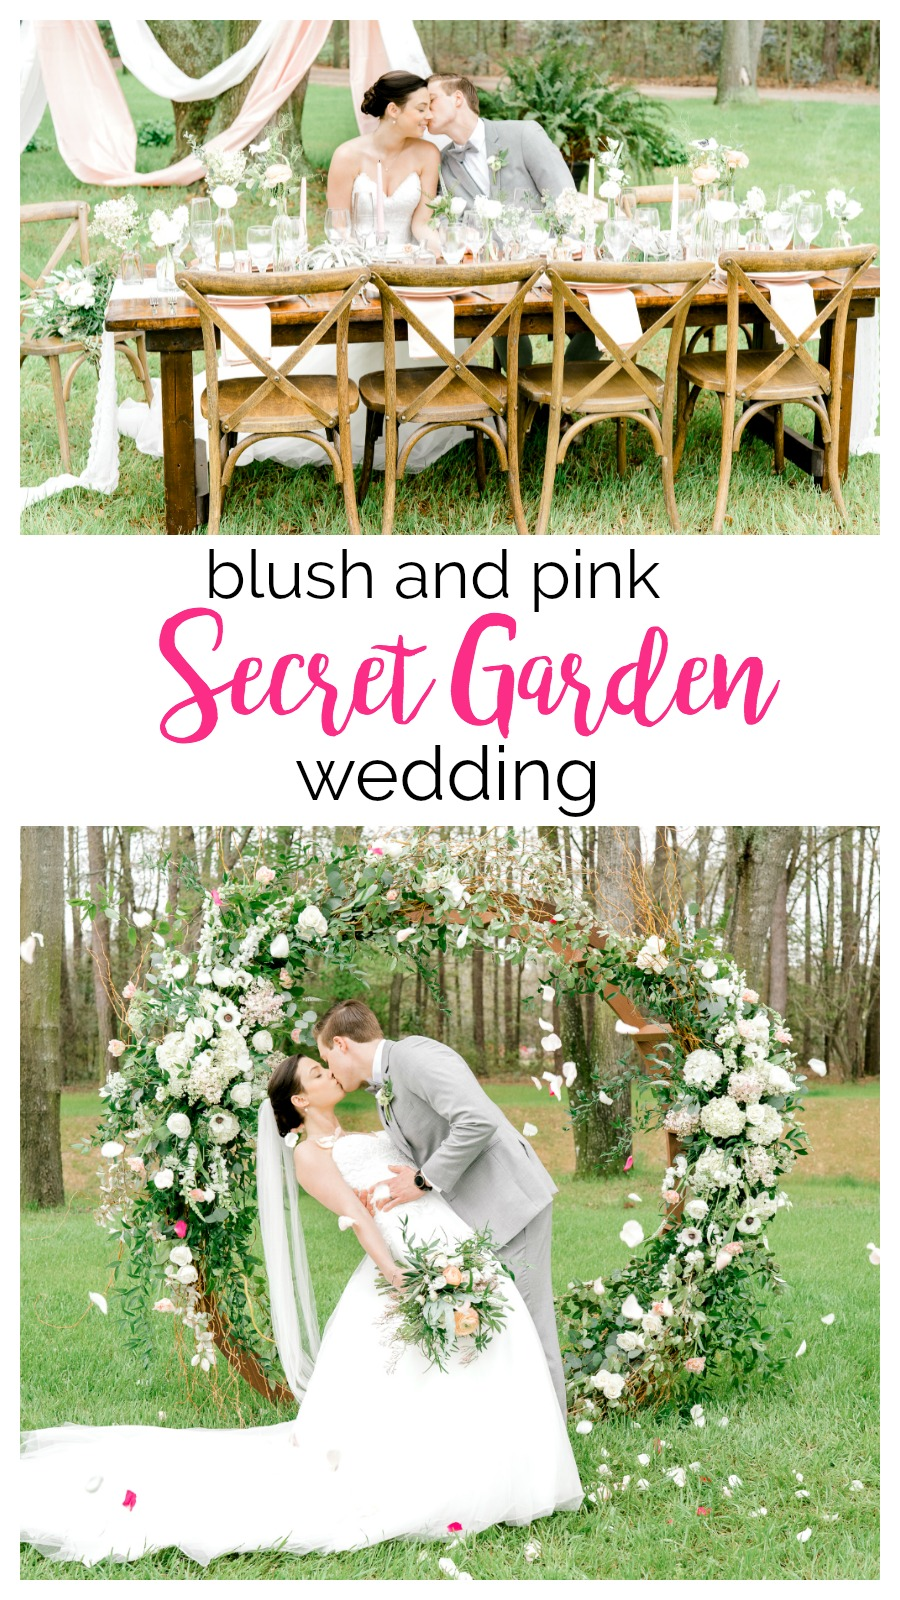 Wedding Inspiration: Secret Garden Wedding Styled Shoot | Palmetto State Weddings | Emma Lili Photography